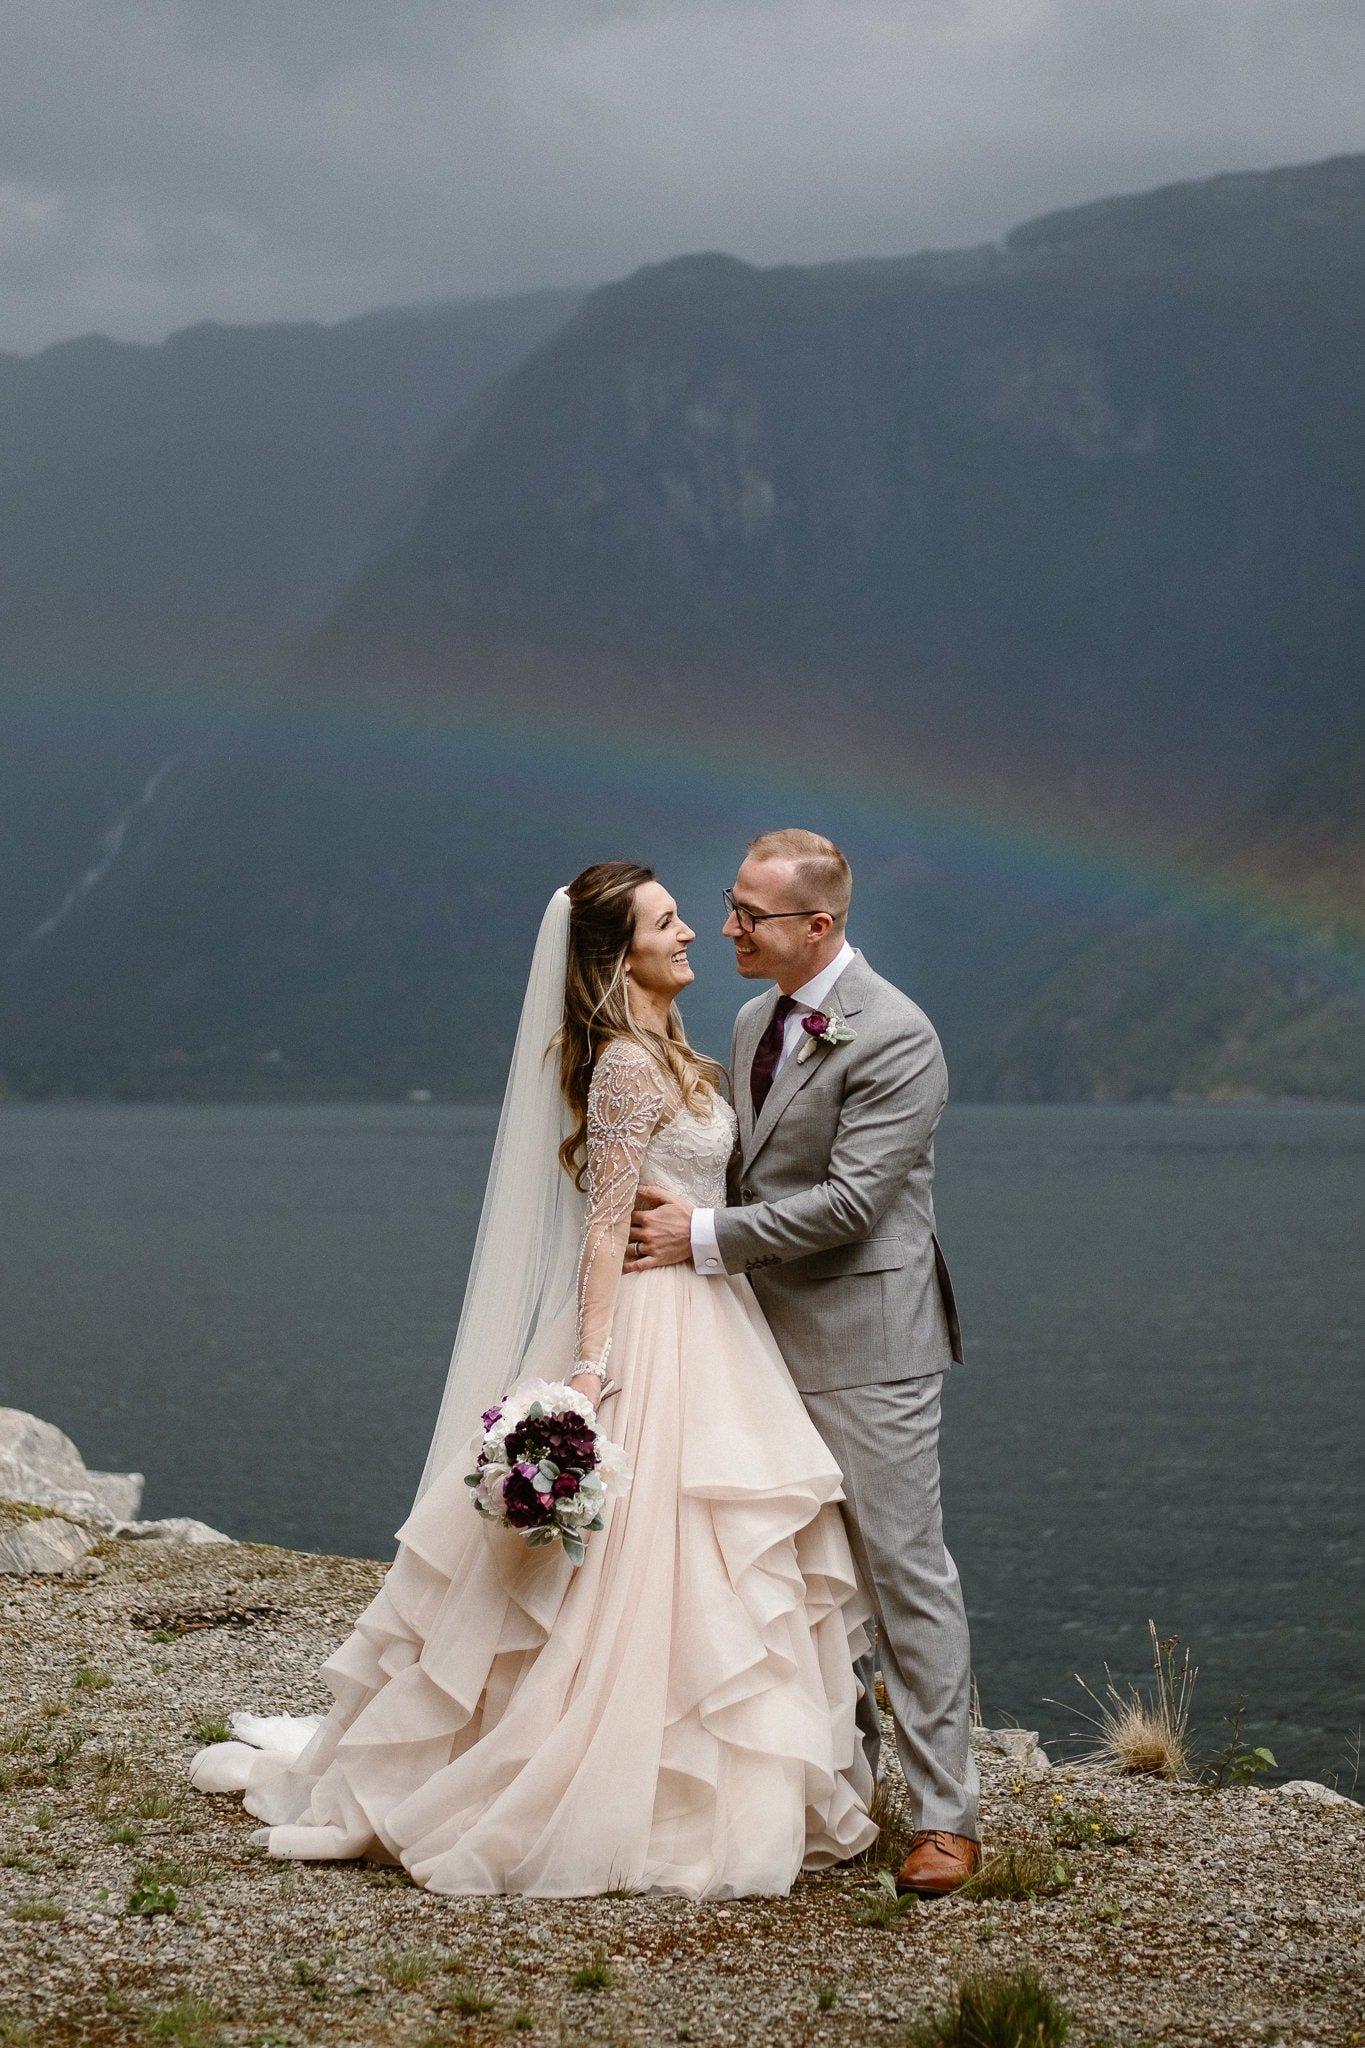 Norway destination wedding photographer, Hardangerfjord bryllup, norsk bryllupsfotograf, Bergen fjord elopement photographer, bride and groom kissing under rainbow in fjord,